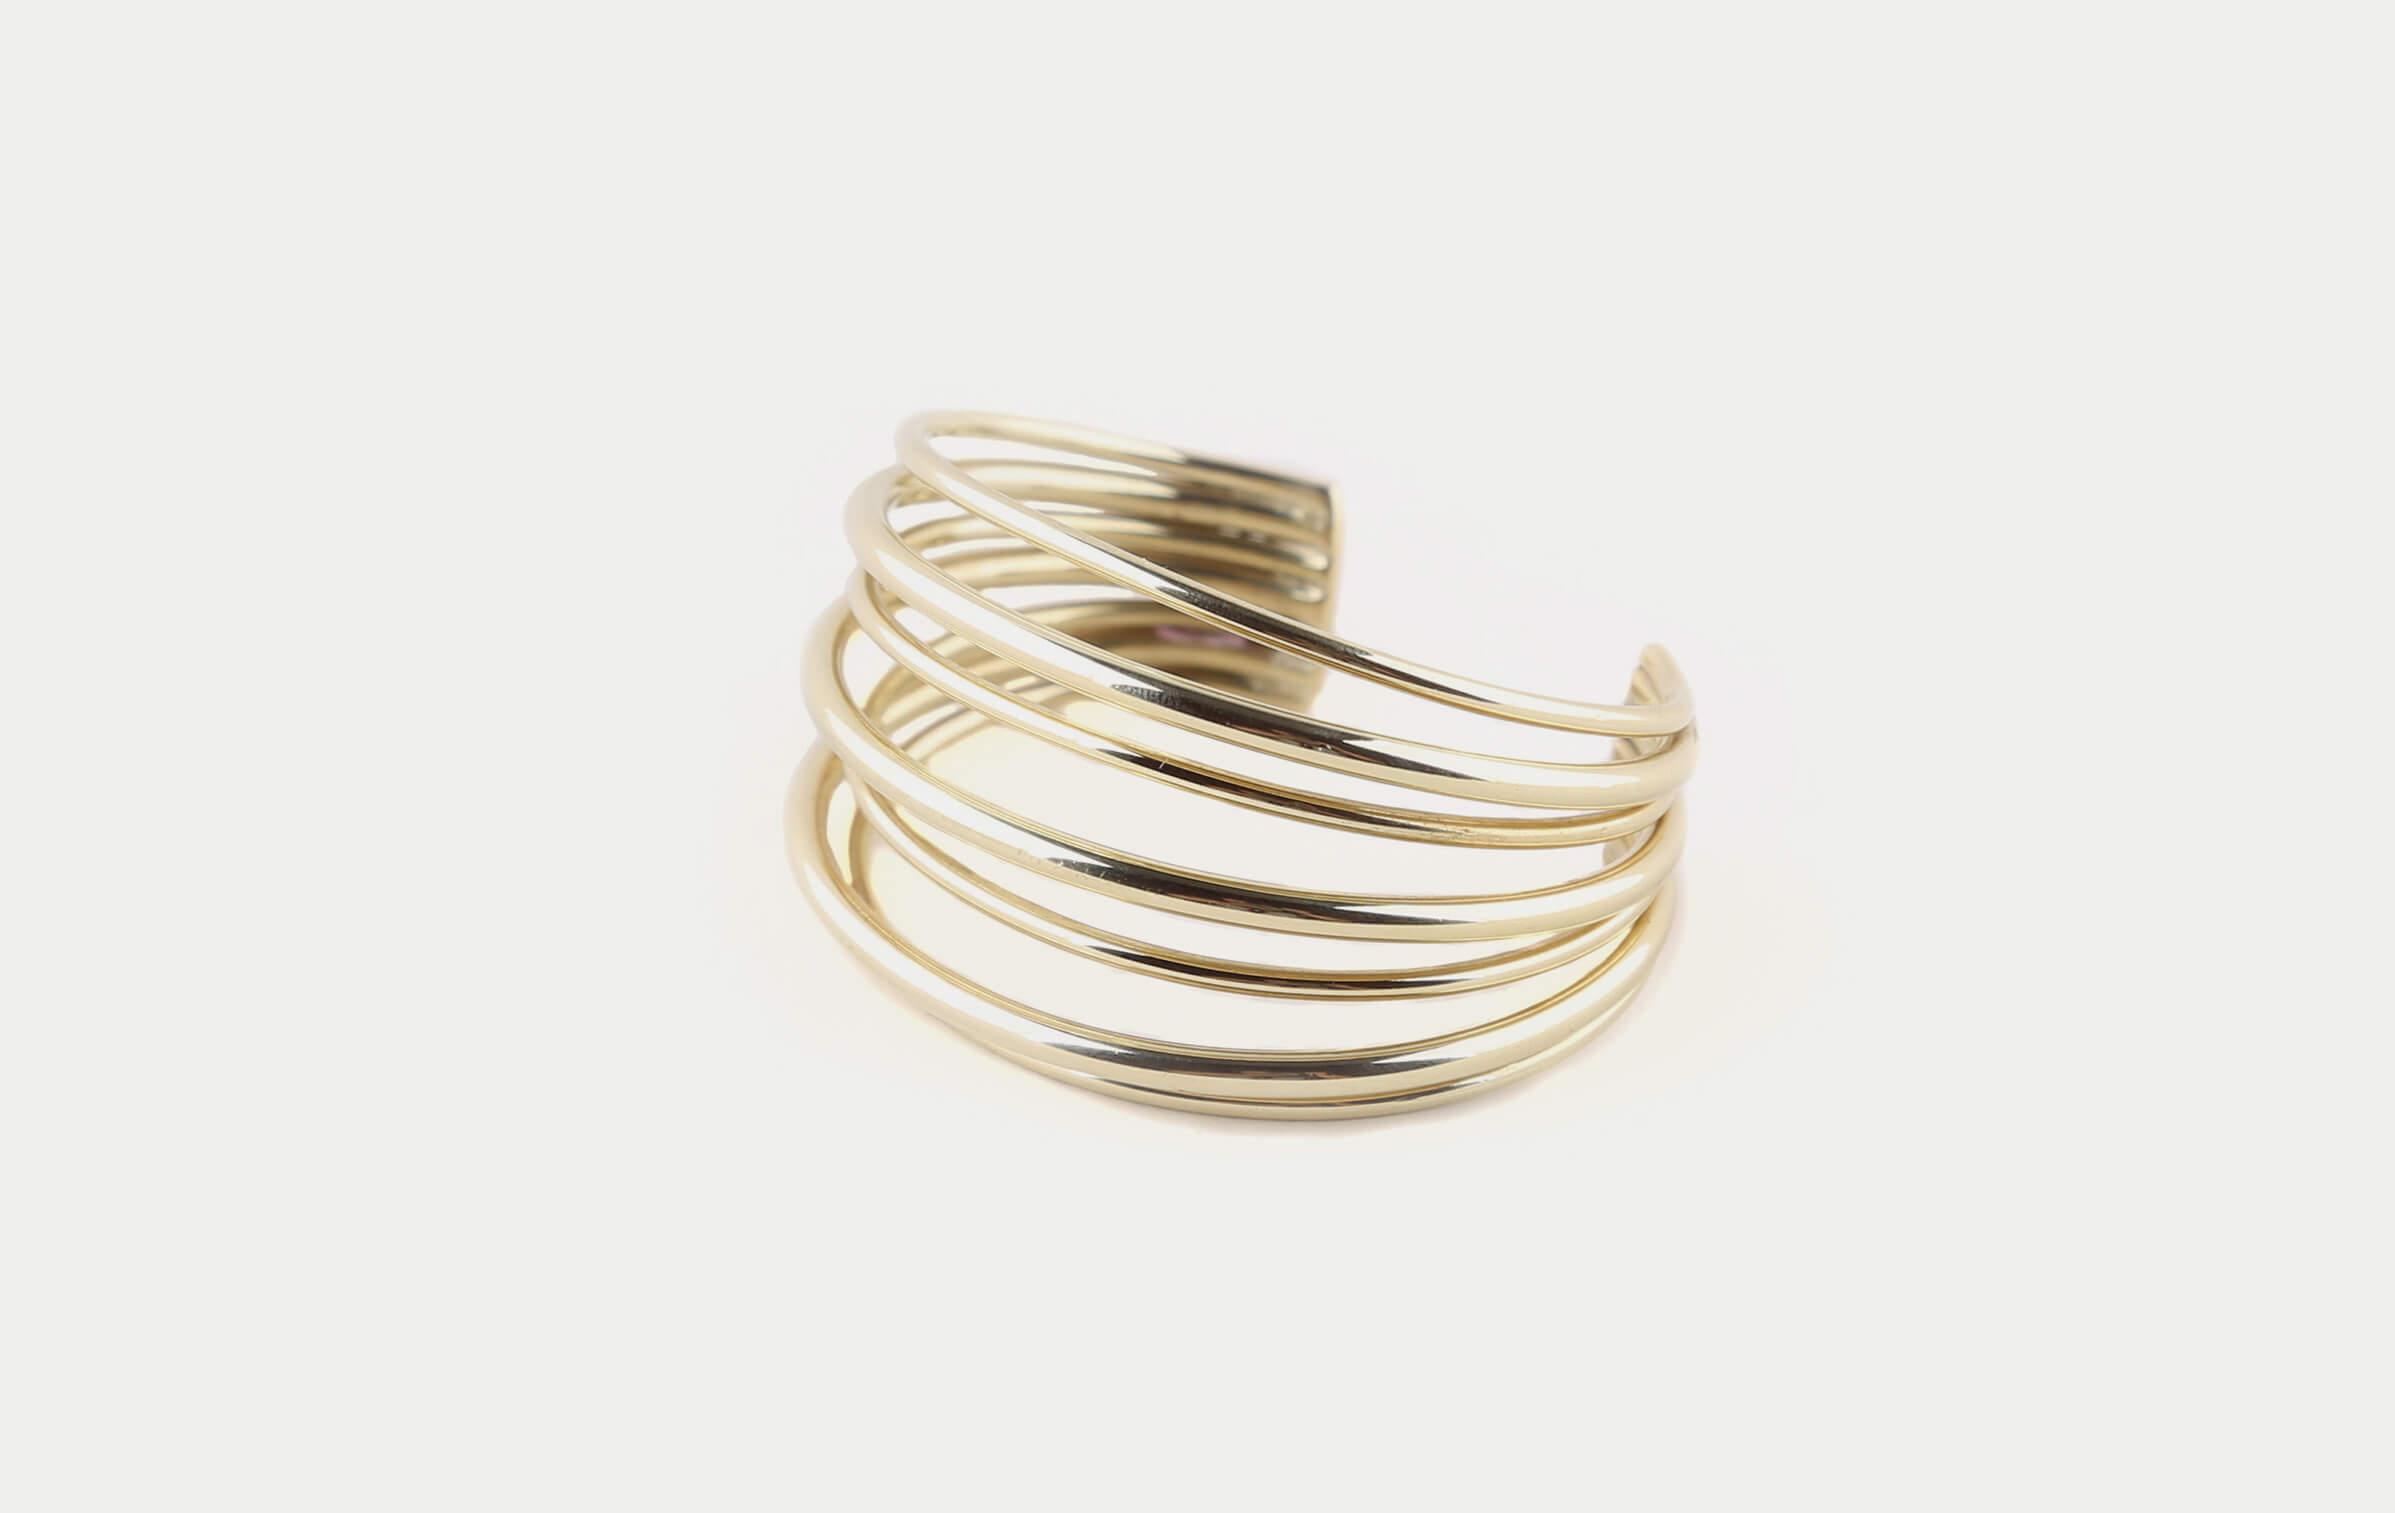 Soko Layered Strand Ring Gold 6 WZqZs0H8d